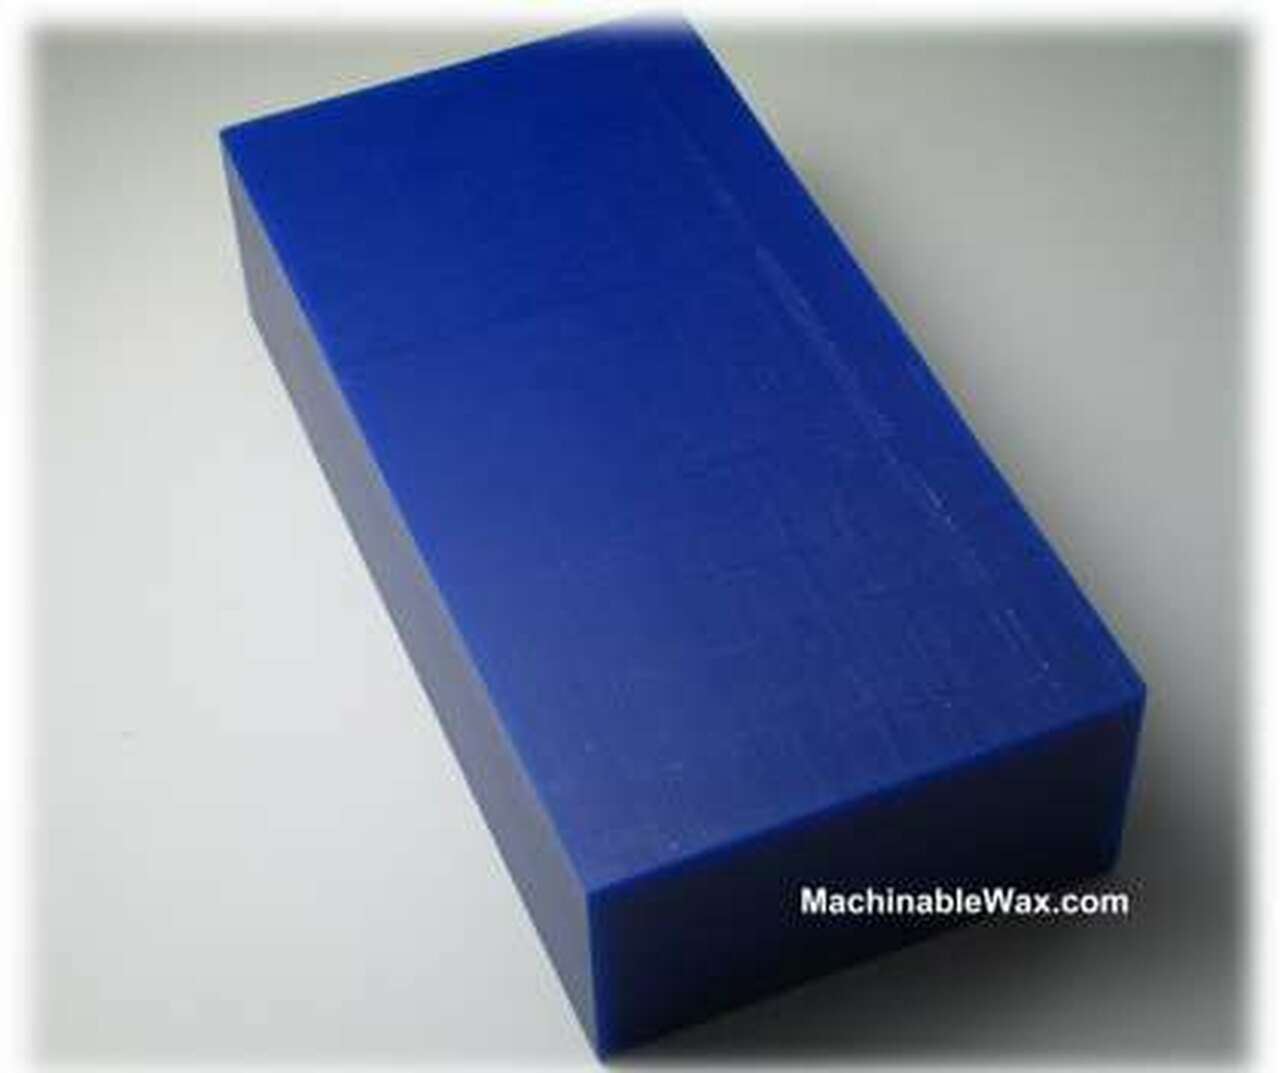 "Machinable Wax Blocks 2"" (51mm) Thick"